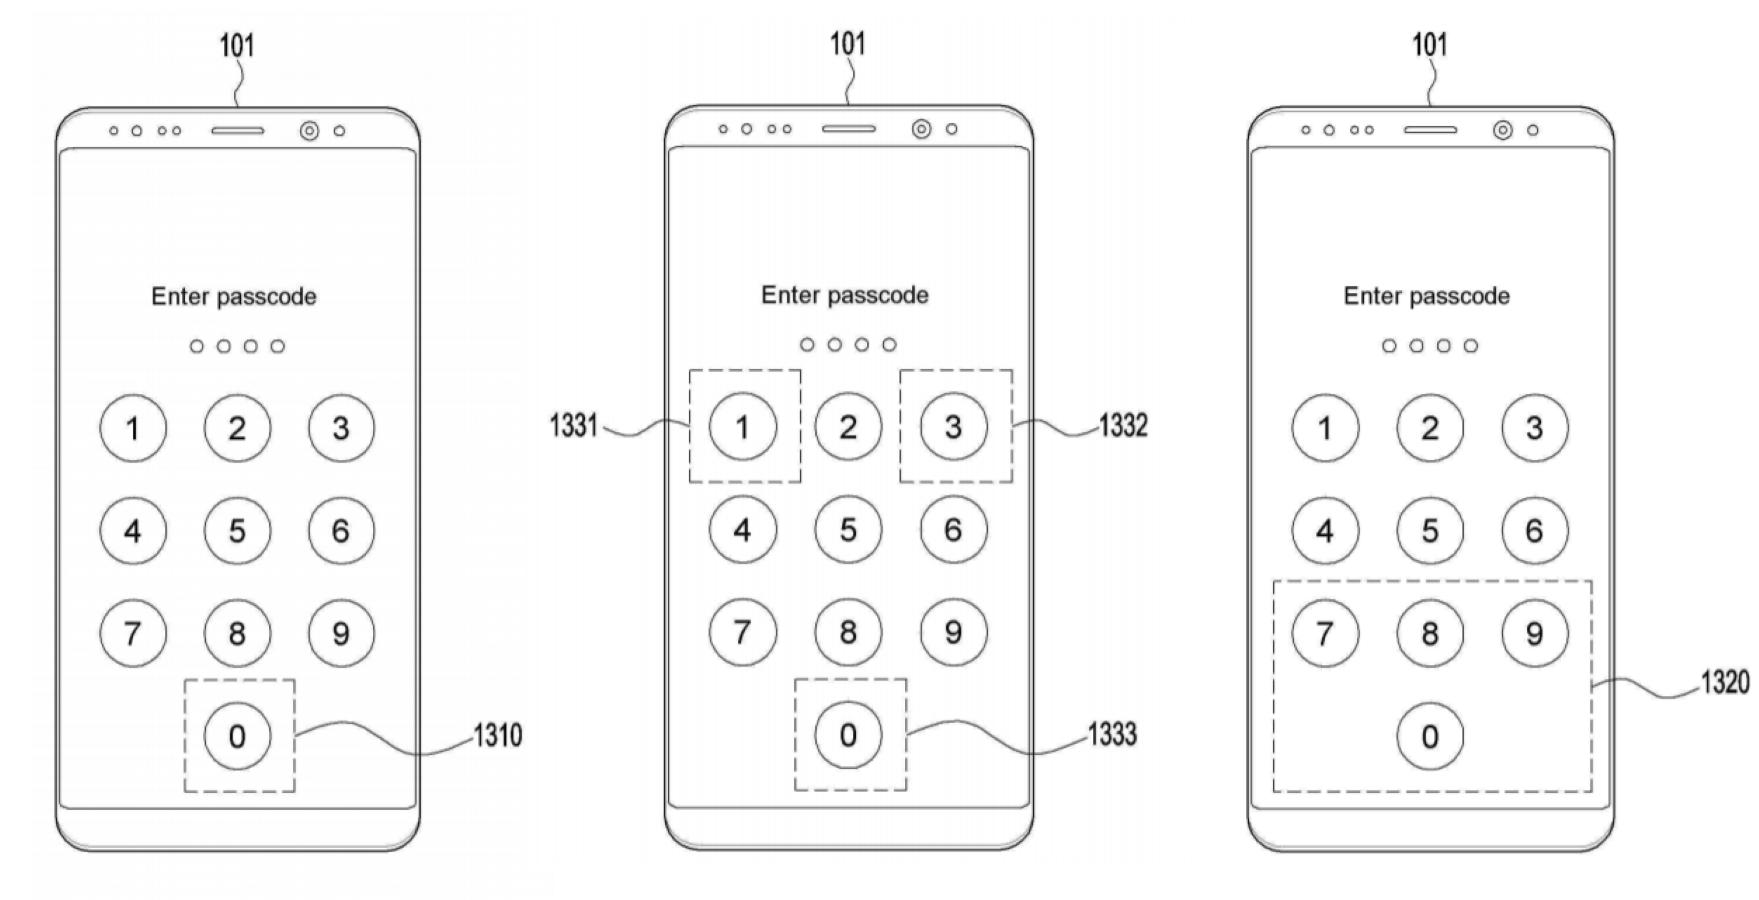 samsung patent two factor authentication fingerprint pin